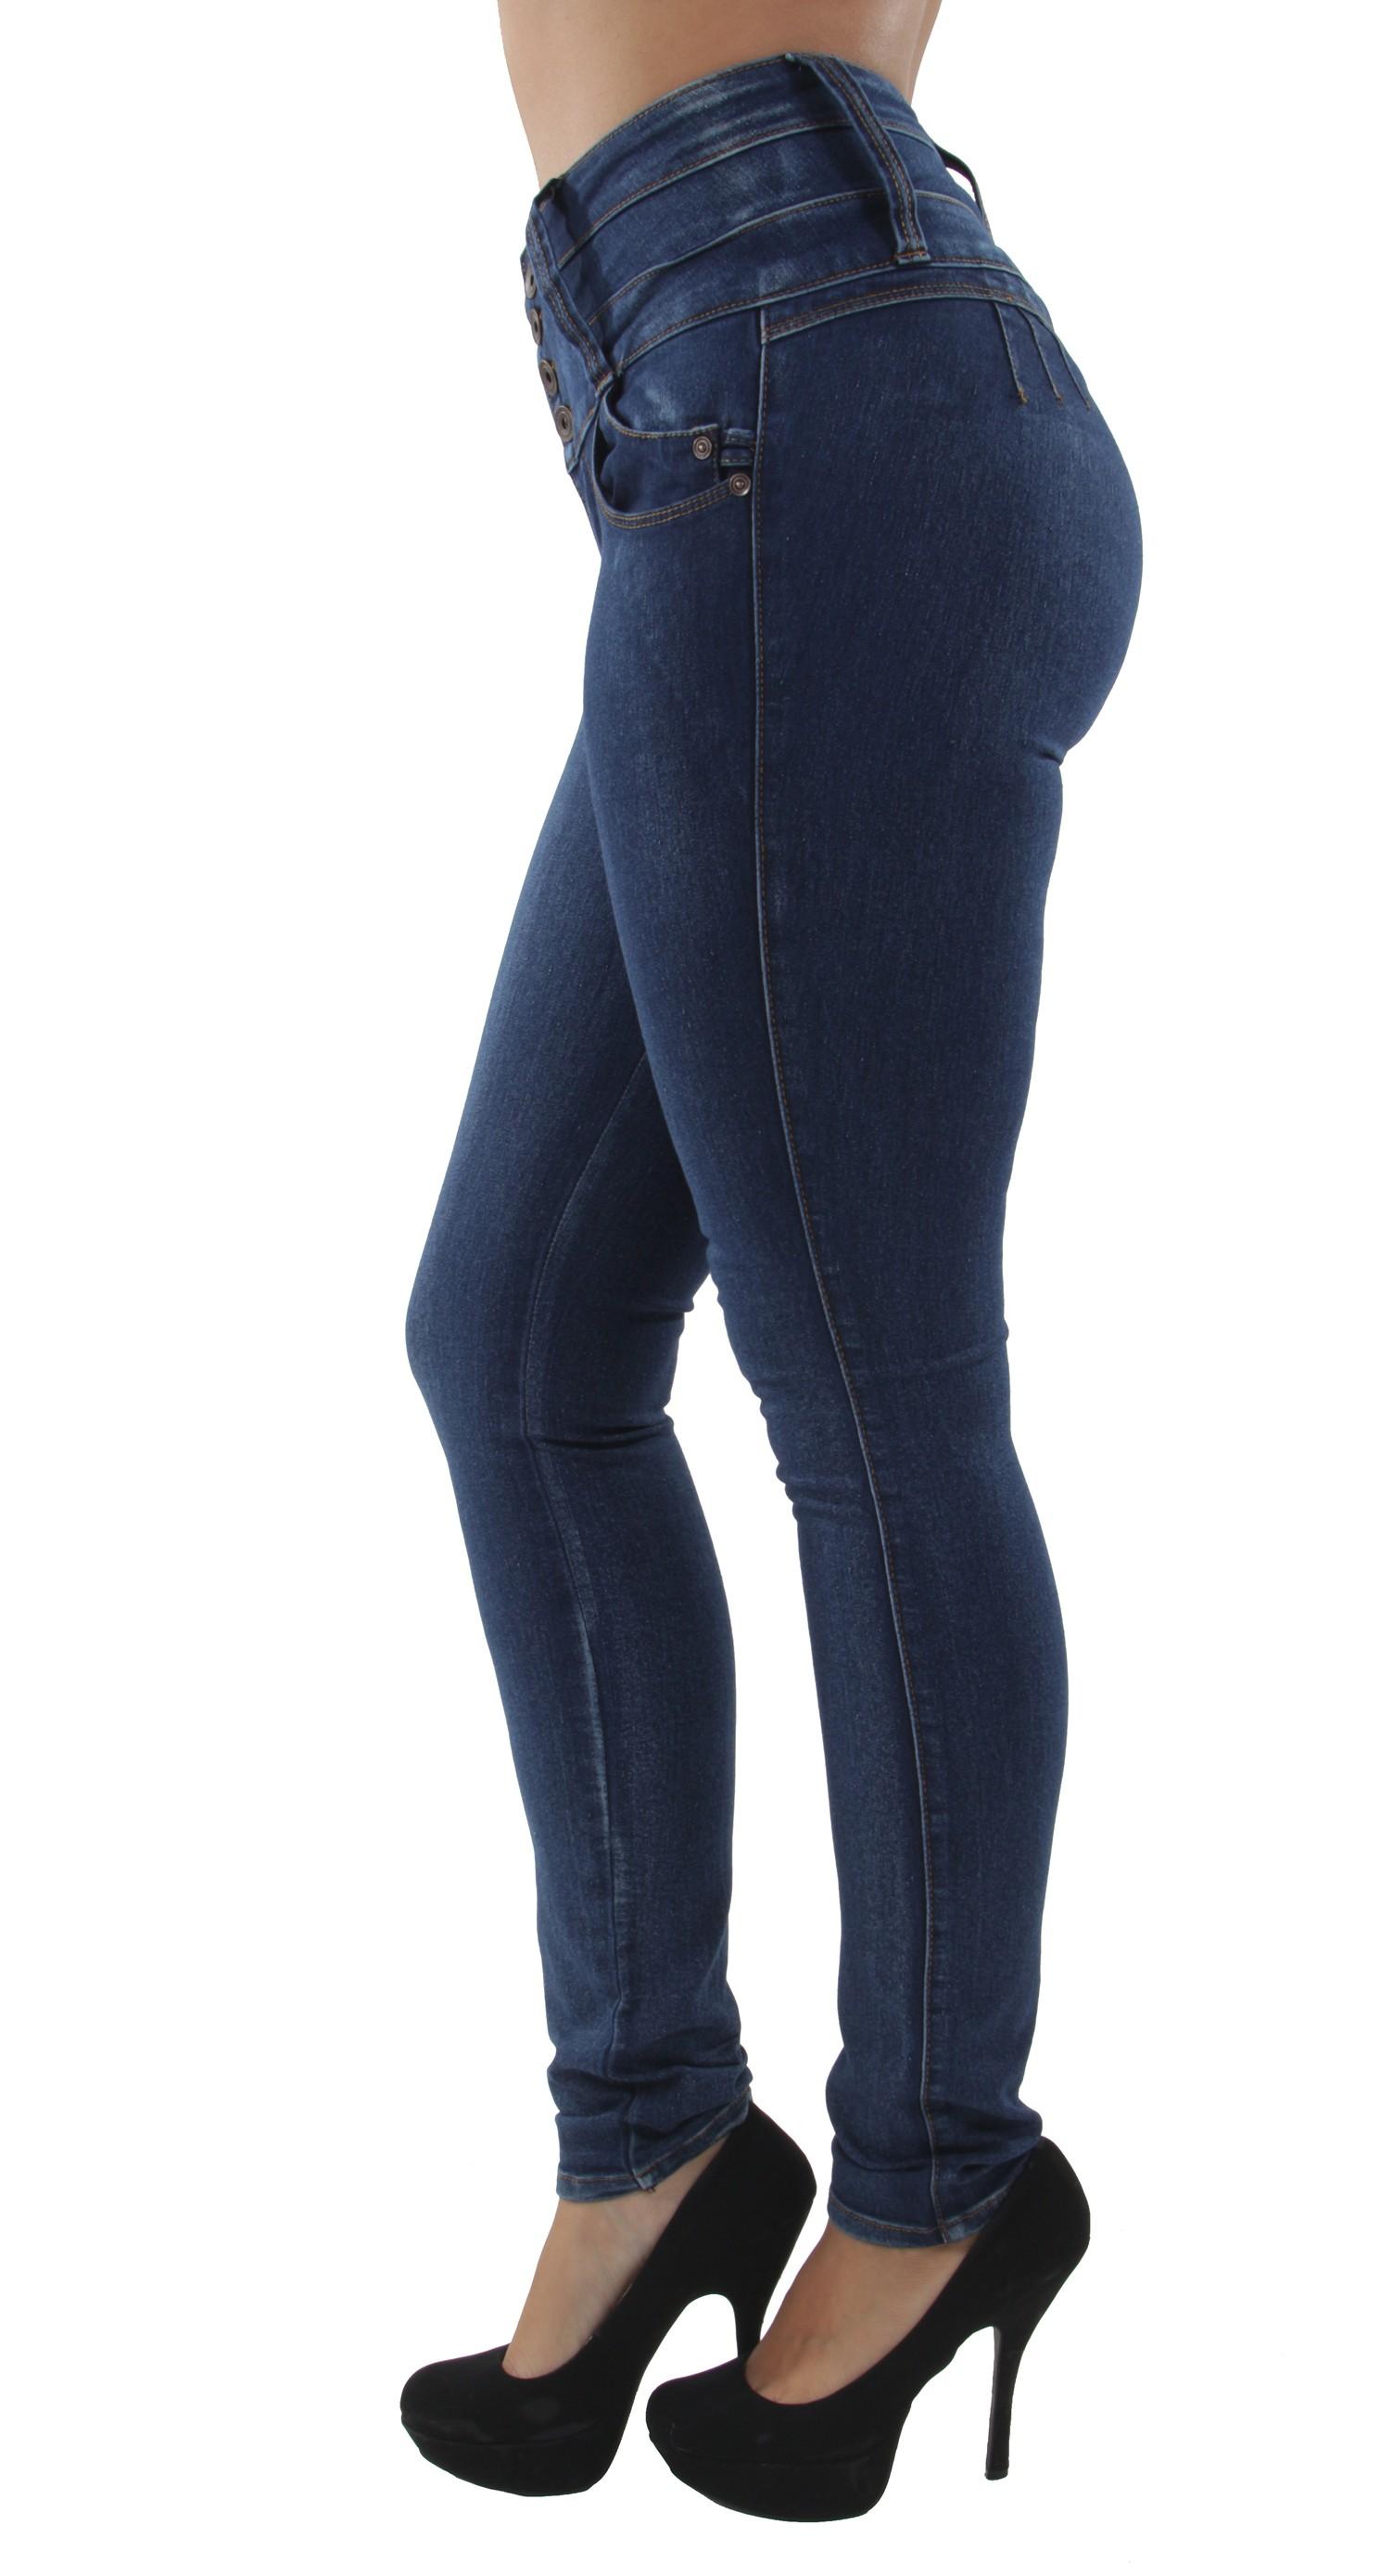 High Waist Colombian Design Butt Lift Push Up Skinny Jeans